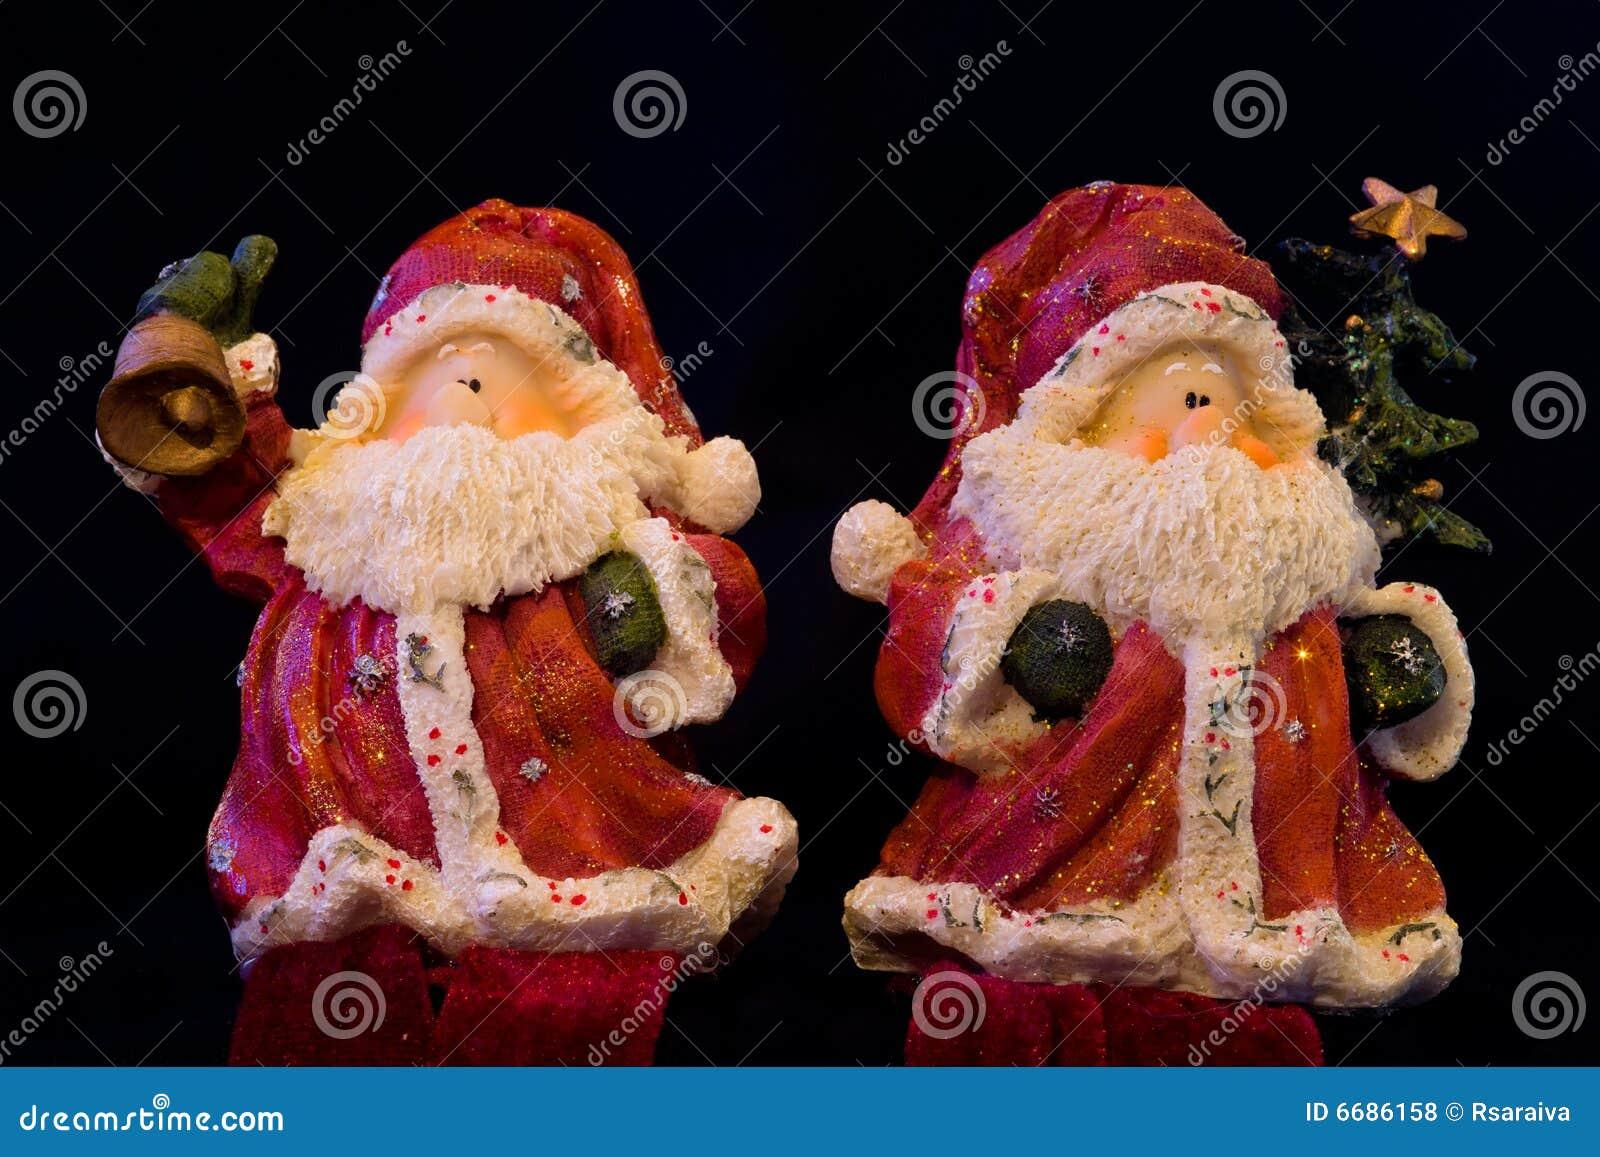 Pair of santa figurines stock photo image of figurine